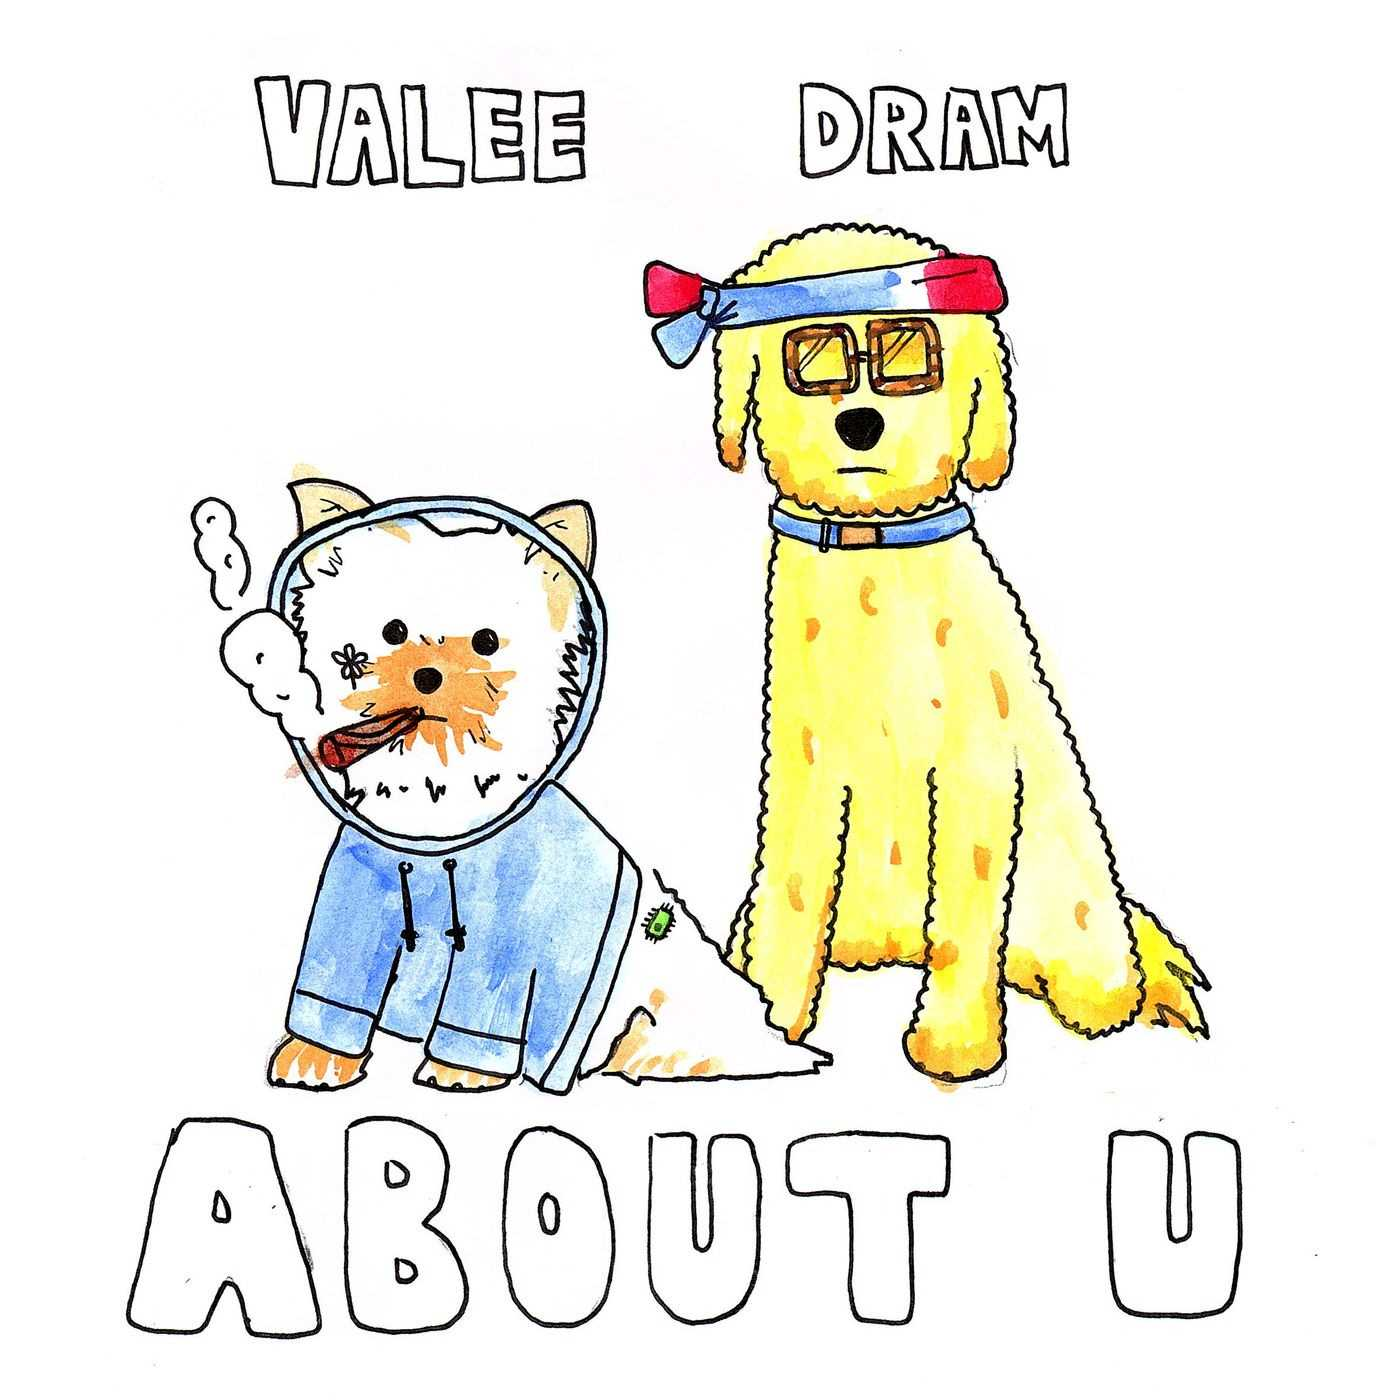 Valee